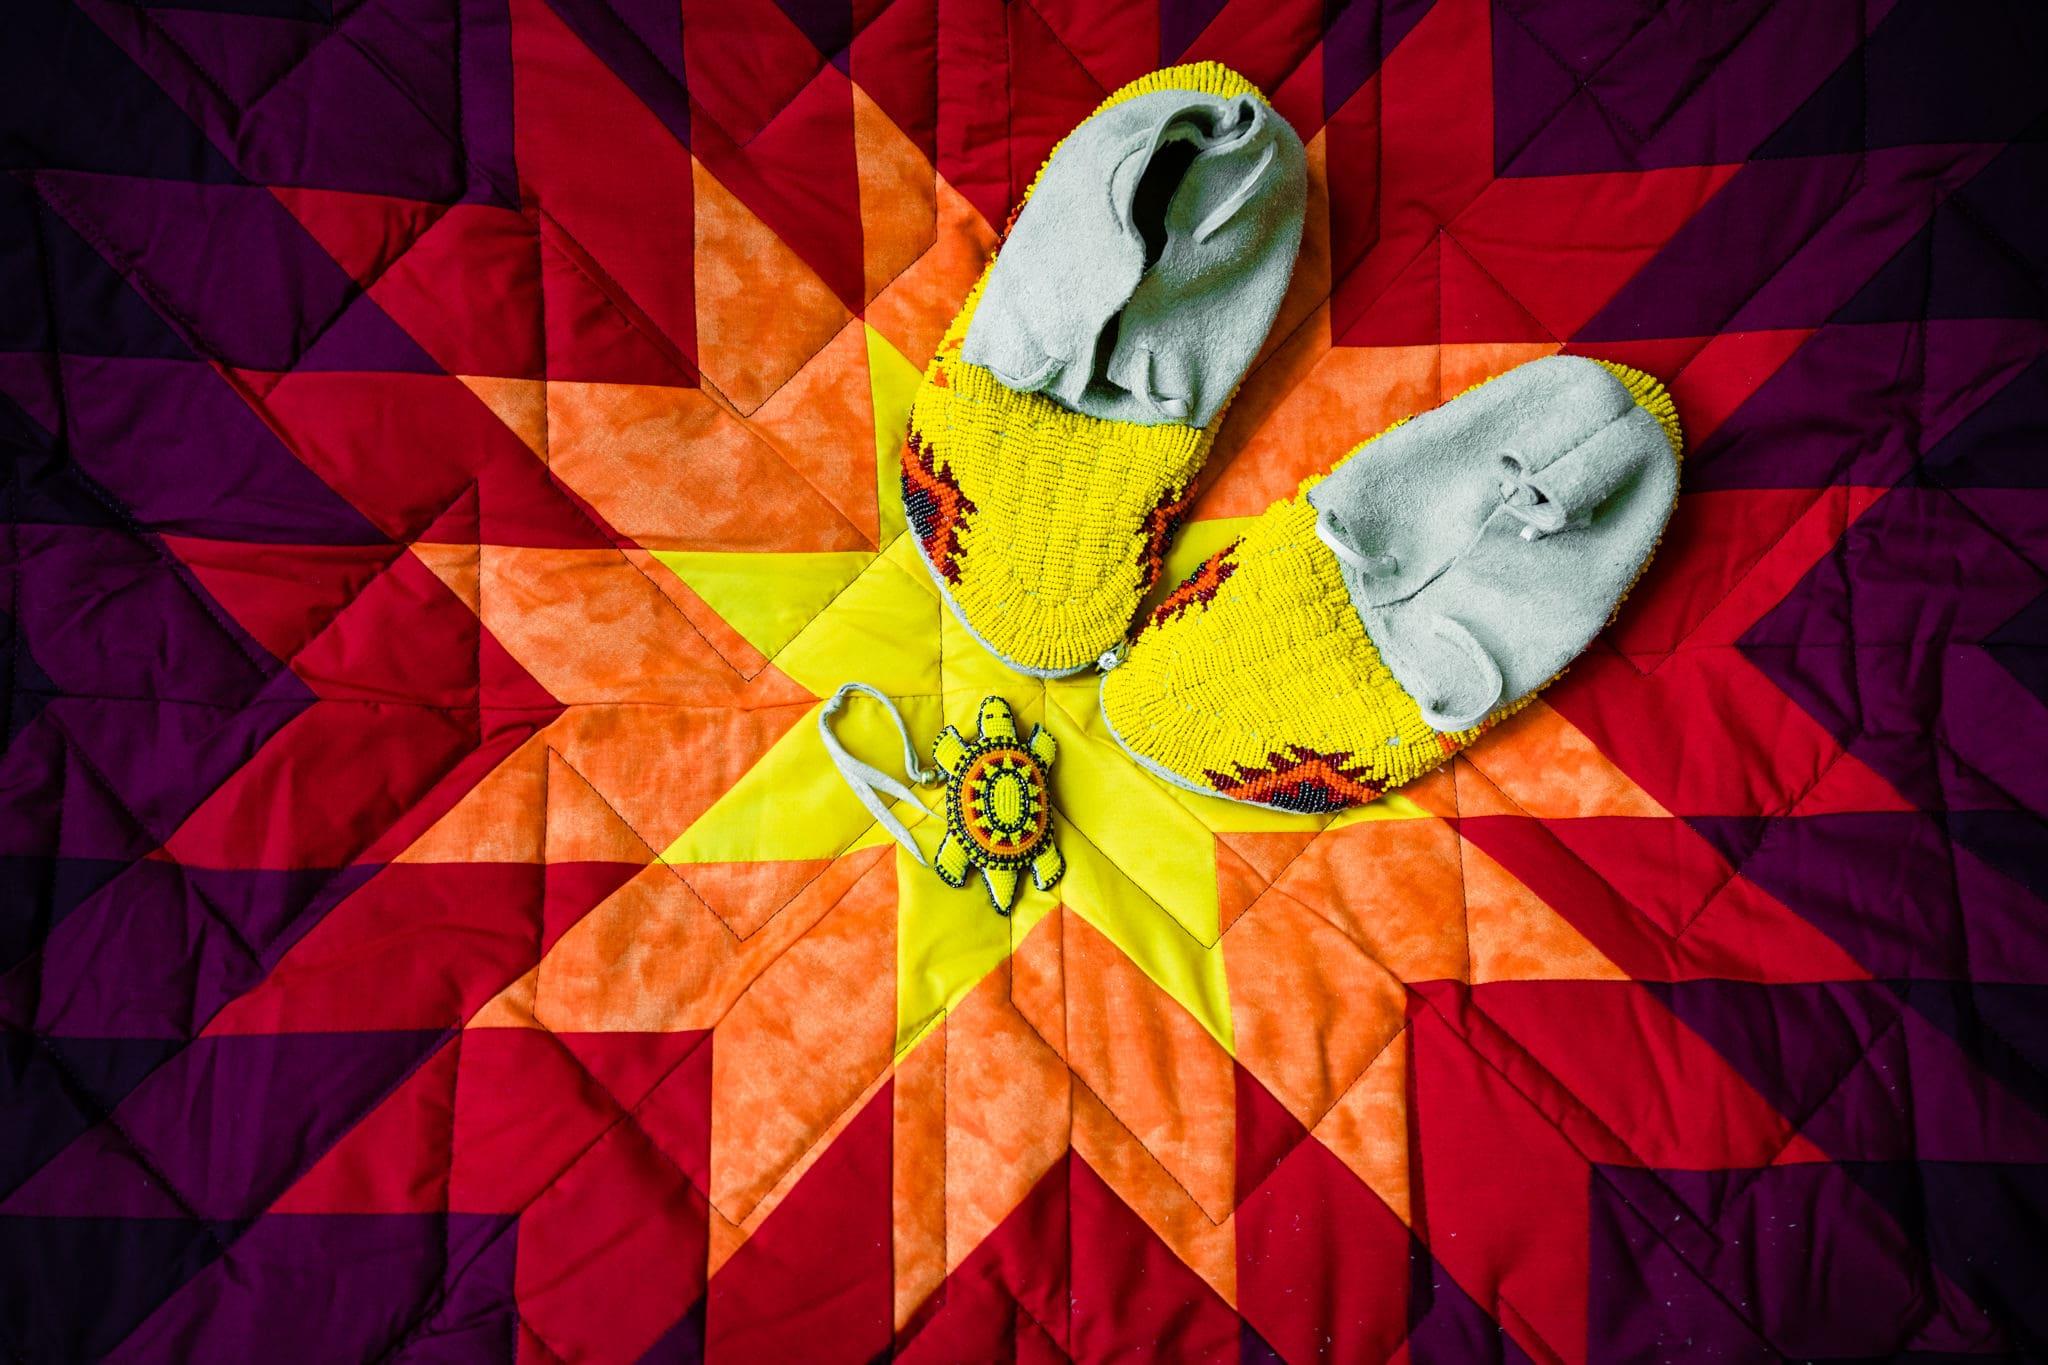 Star Quilt Lakota Souix Tribe